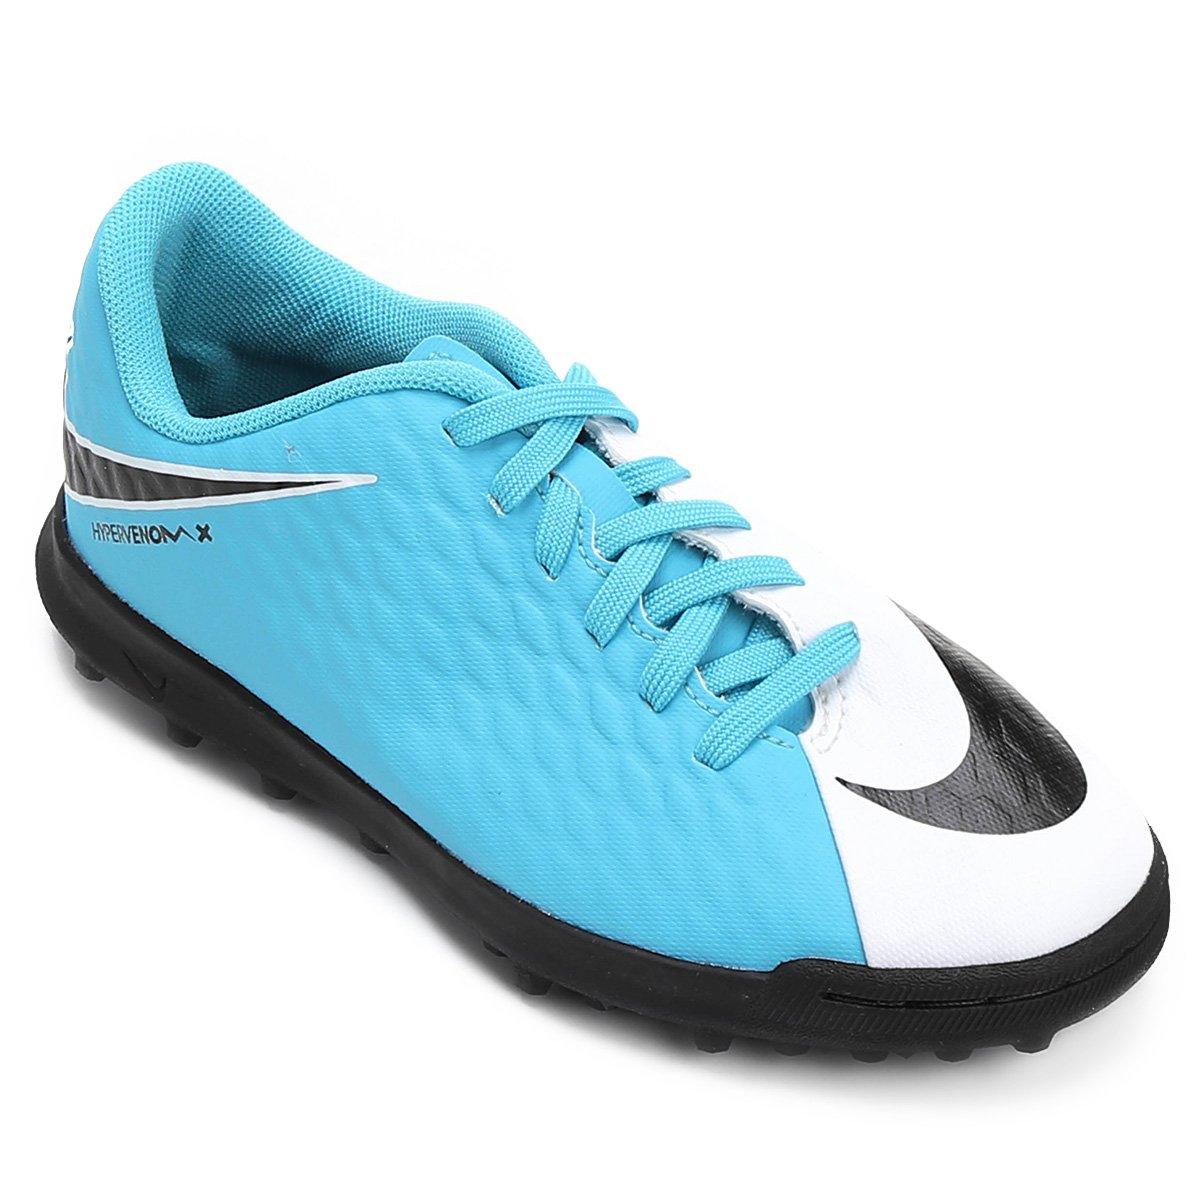 Chuteira Society Infantil Nike Hypervenom Phade 3 TF - Compre Agora ... b9c9564281cf5